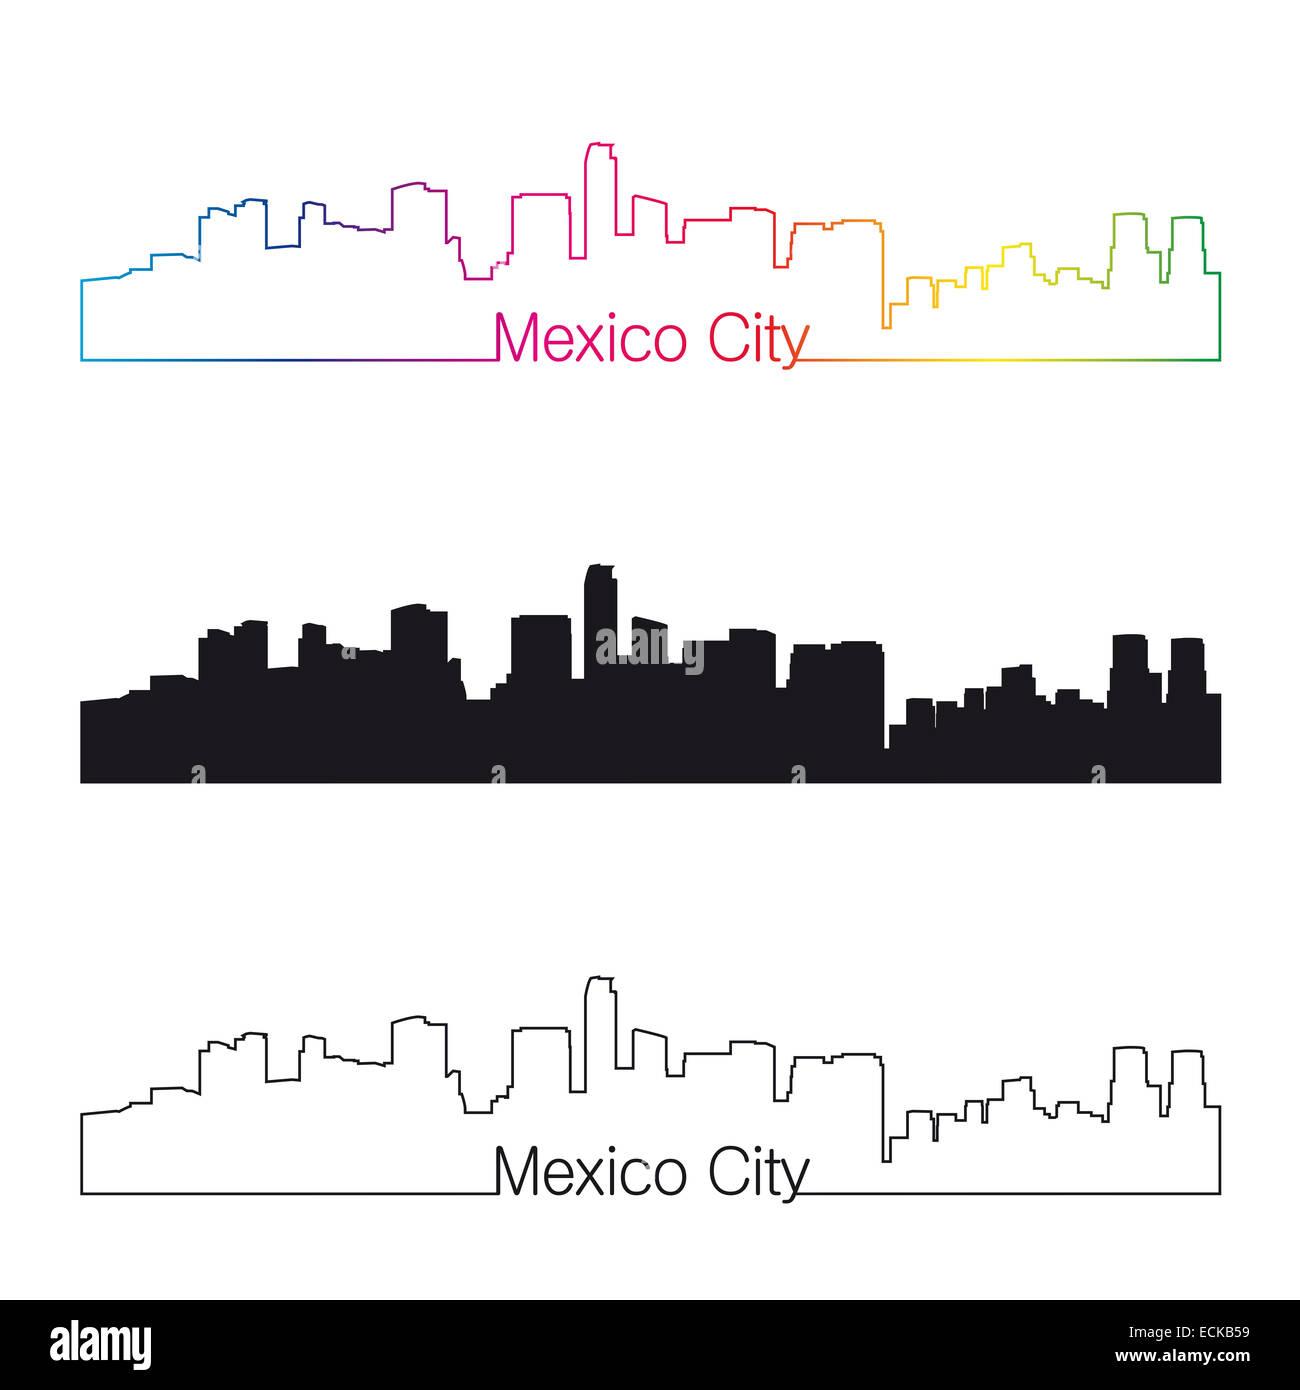 Mexico City skyline linear style with rainbow - Stock Image